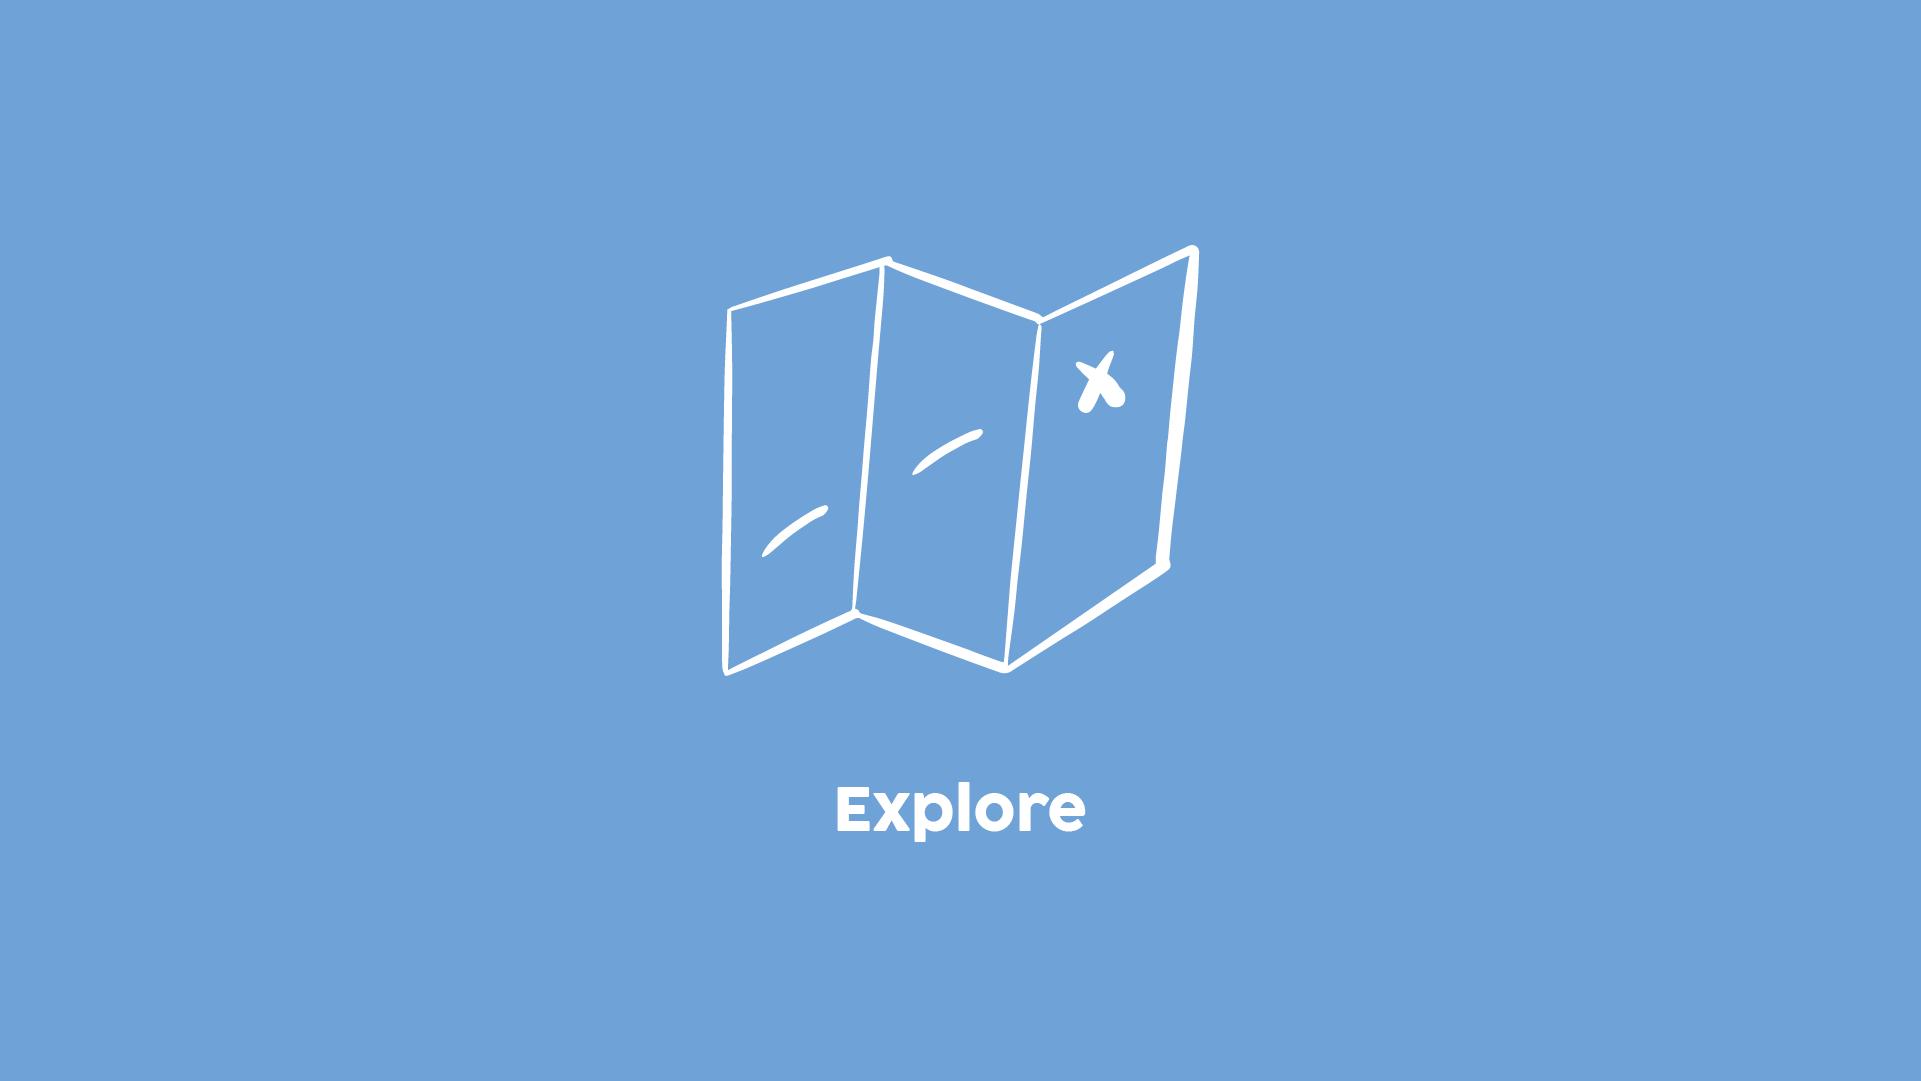 Create Develop Explore-29